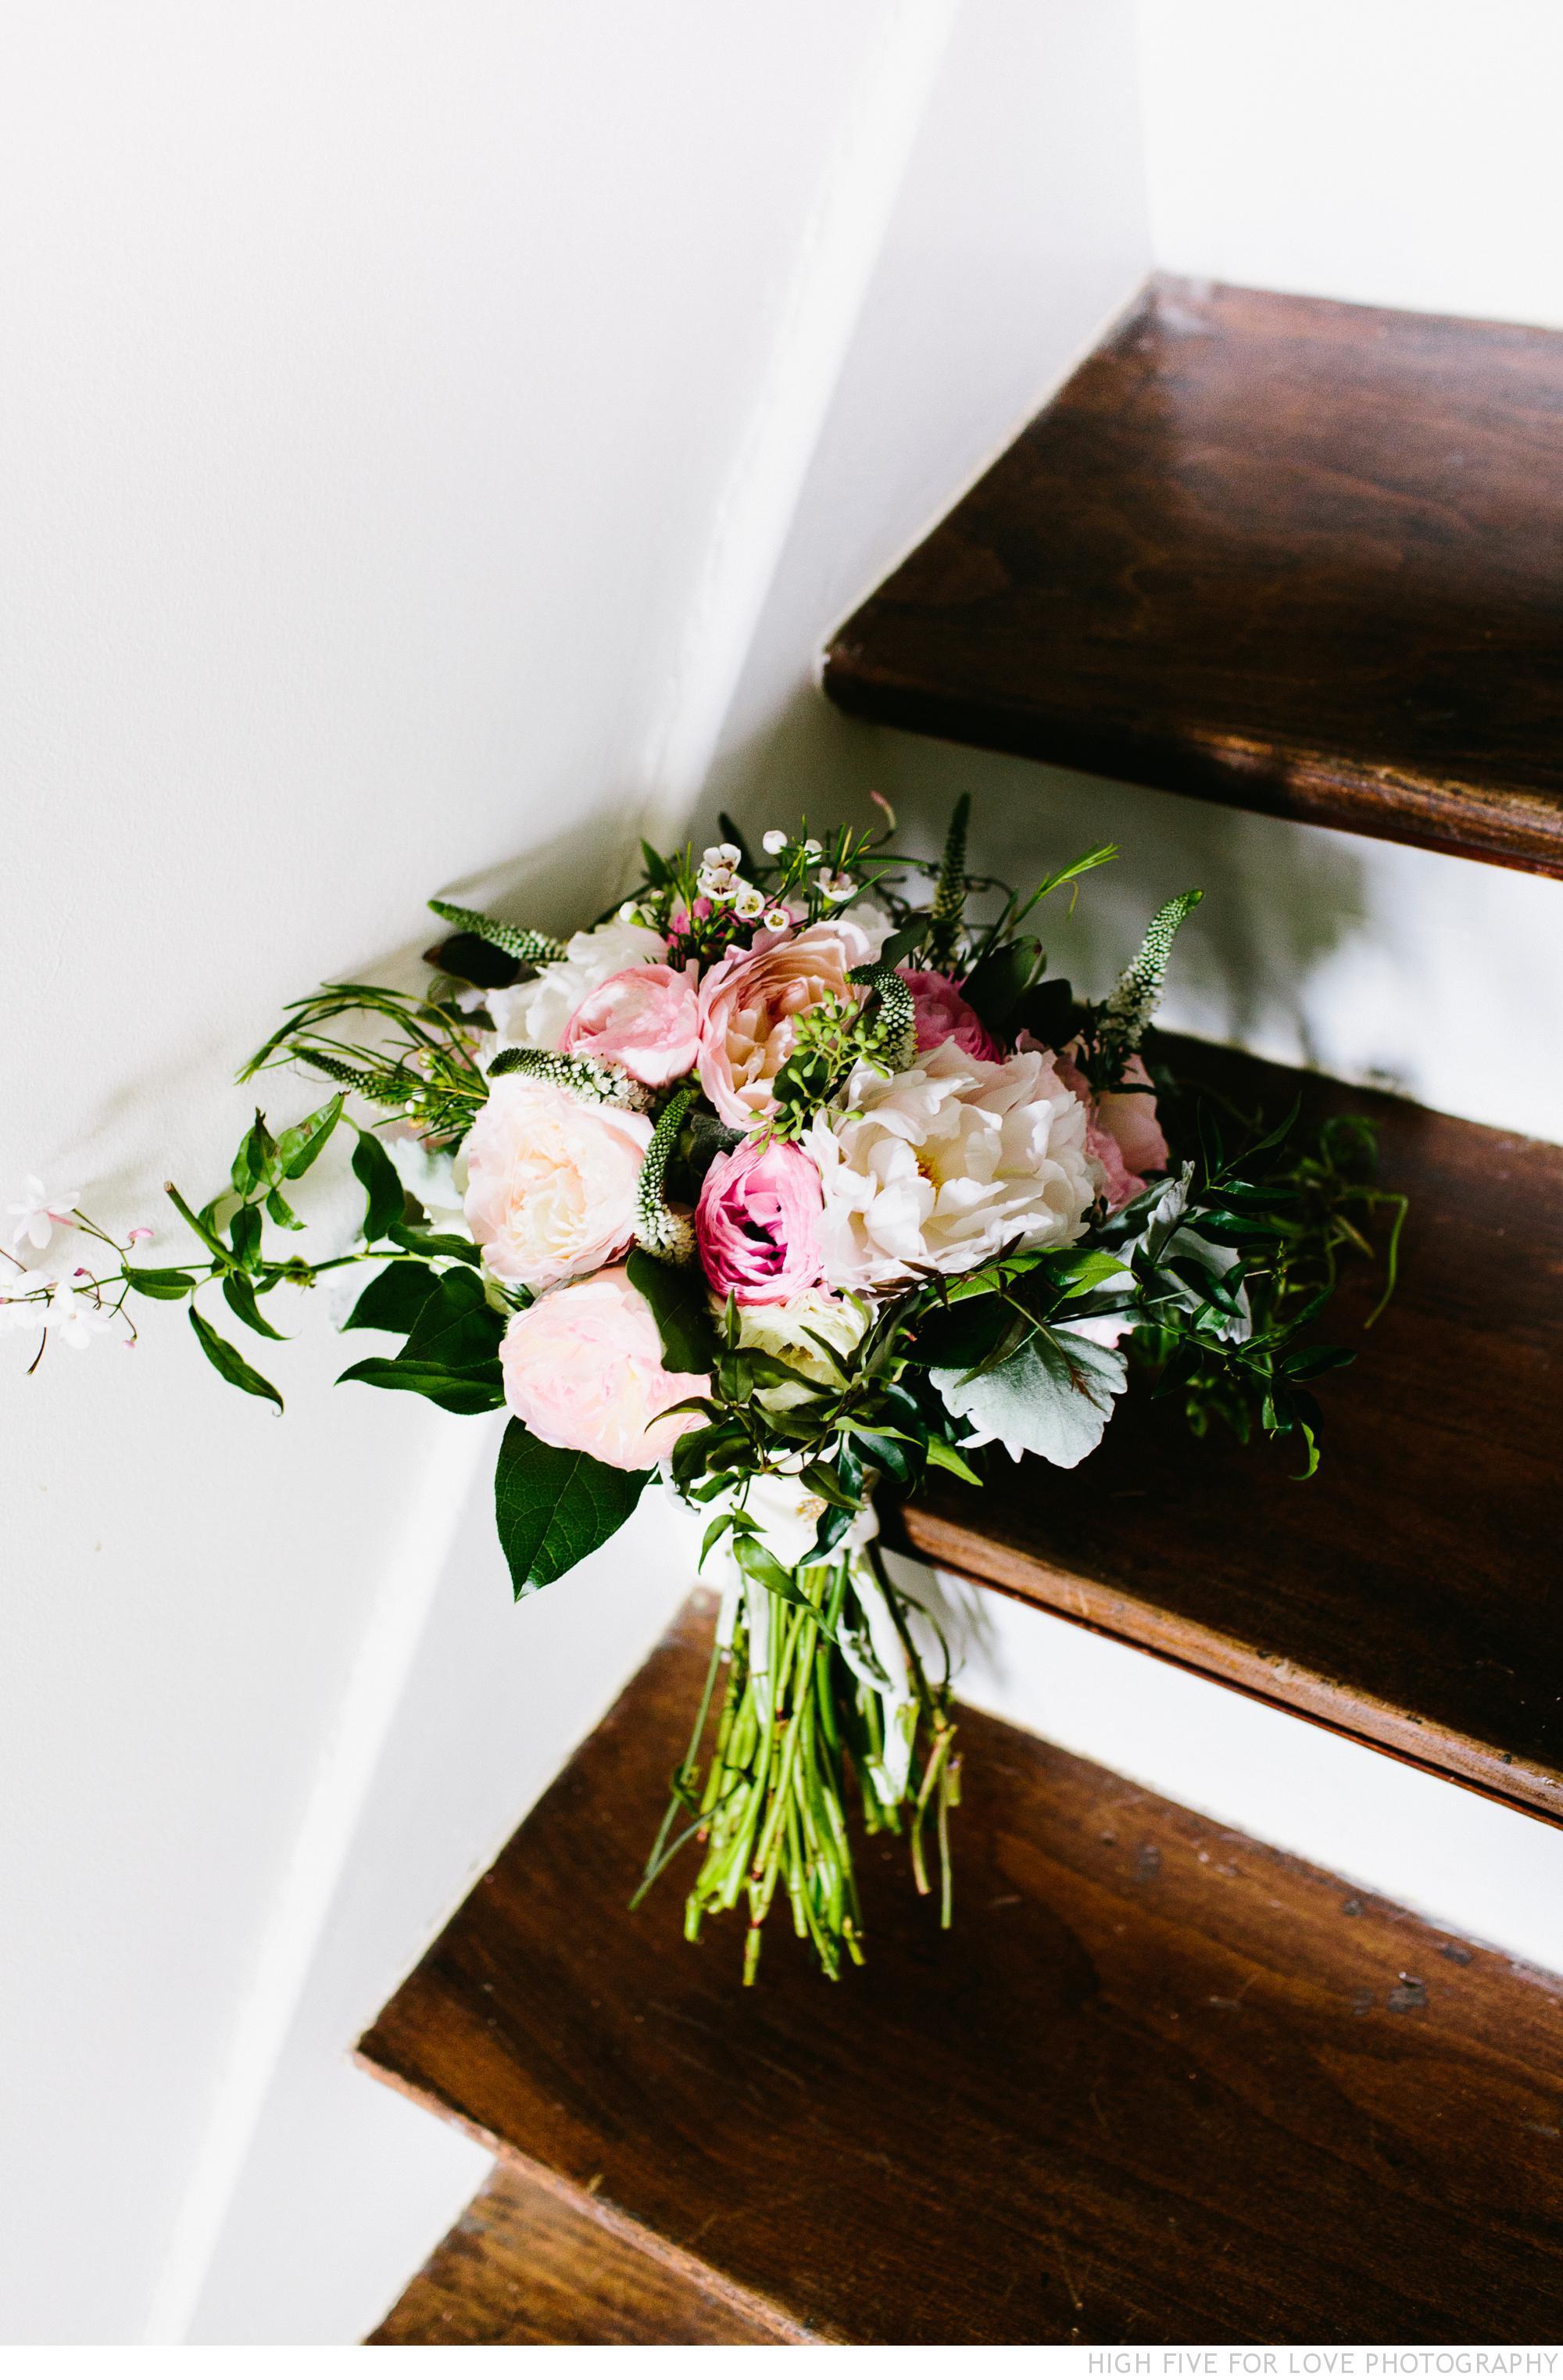 HFFL-Merrick-Freeman-Wedding_0011.jpg